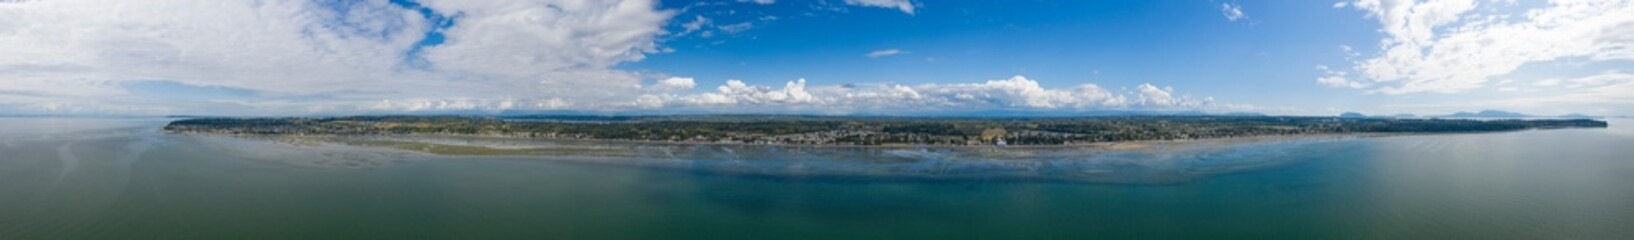 Birch Bay Washington Waterfront Coast Panorama